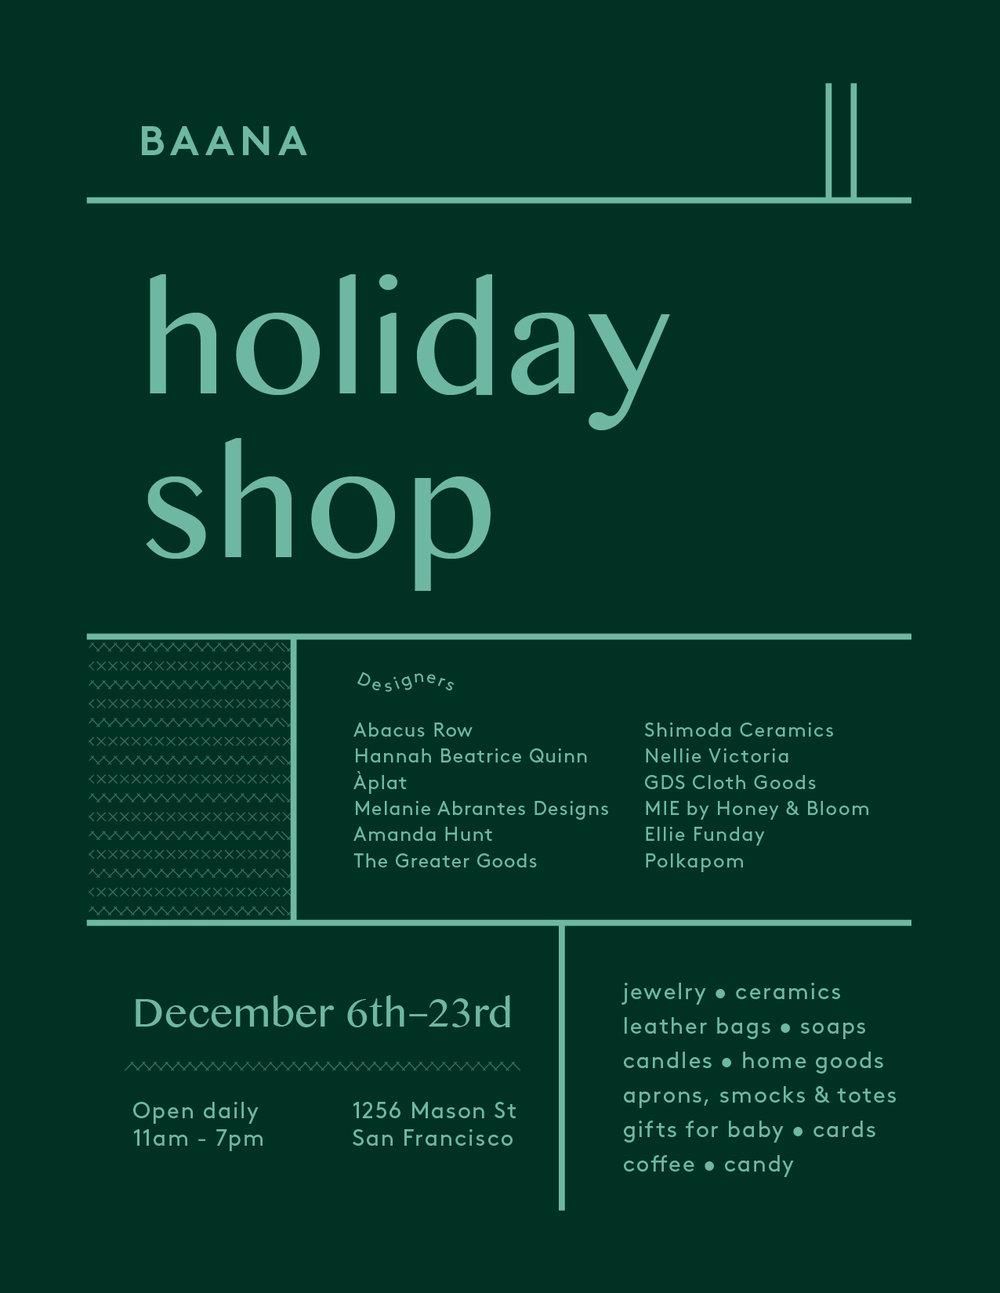 BaanaHolidayShop_Flyer.jpg